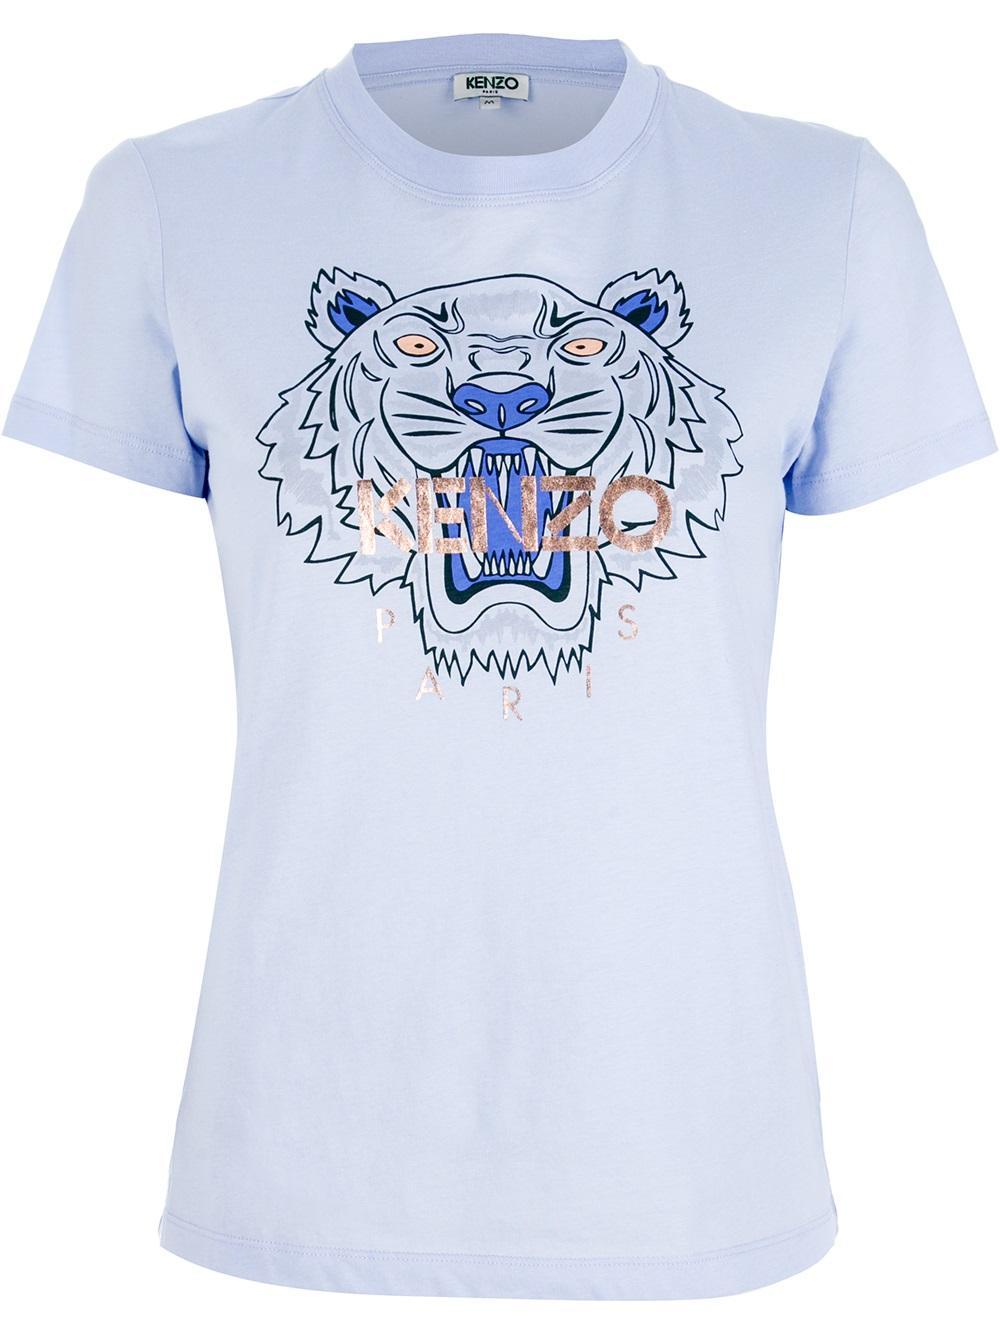 e62b6847 KENZO Tiger Print T-Shirt in Blue - Lyst